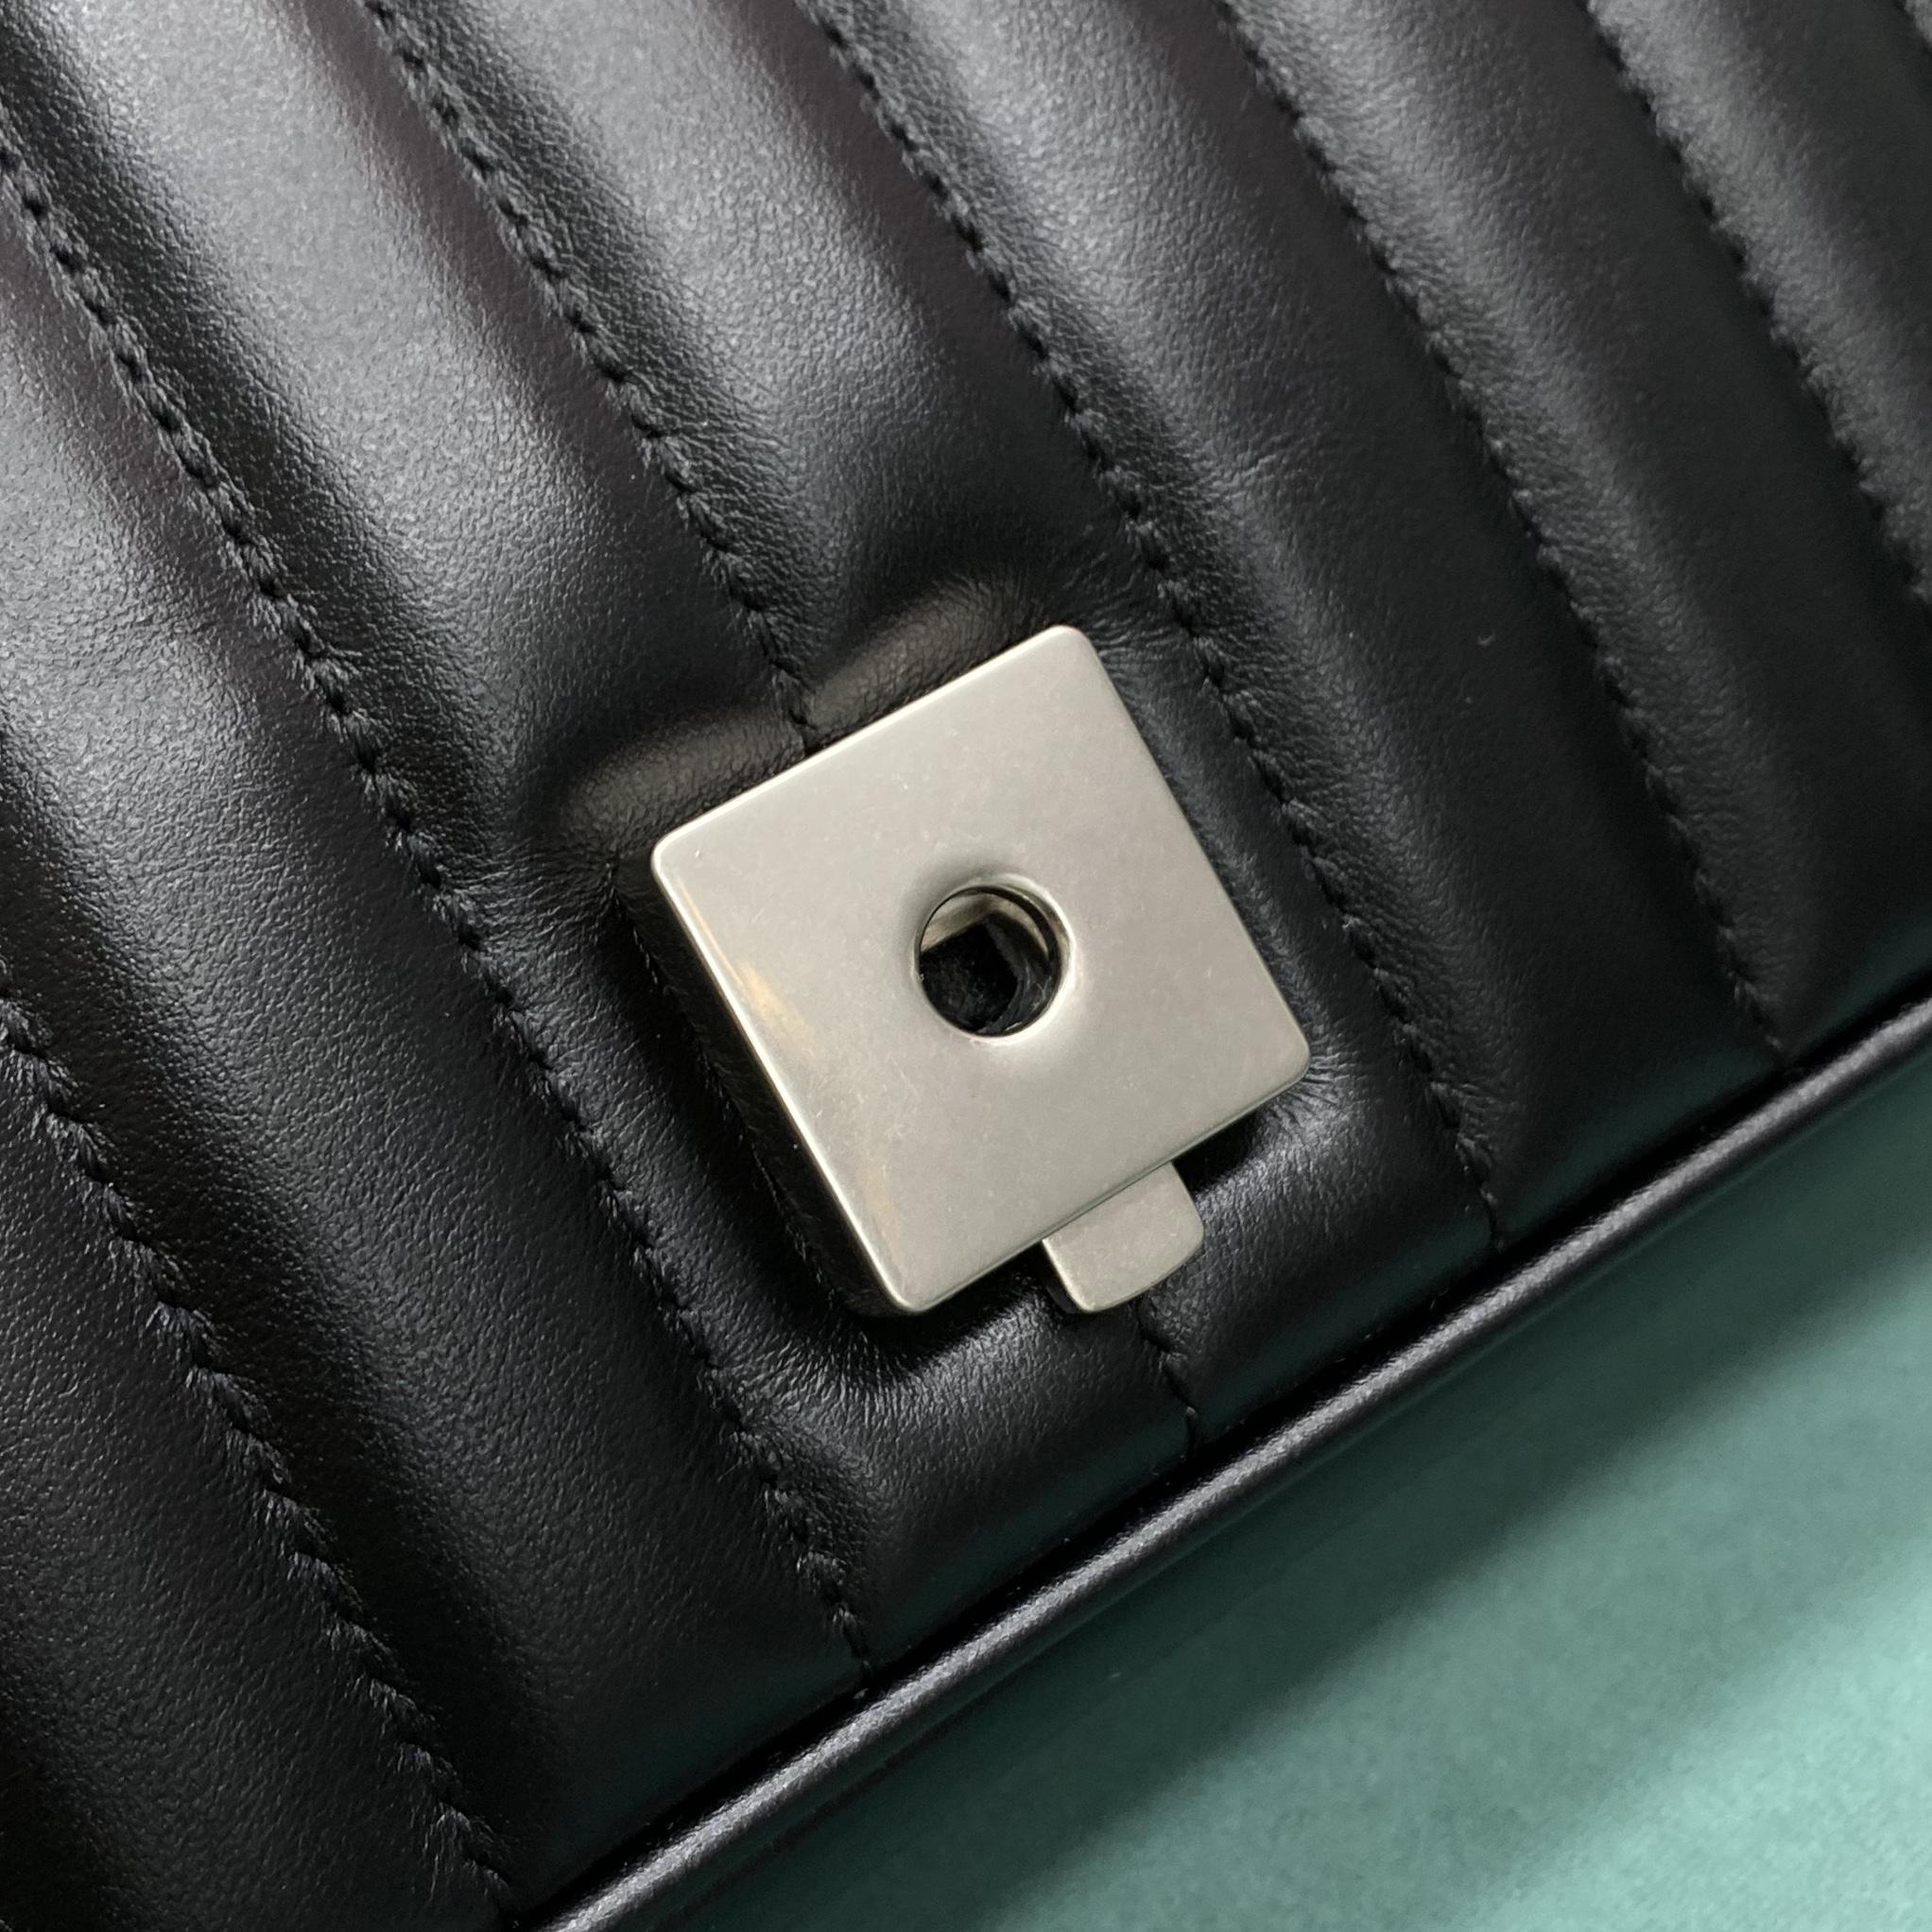 【P1250】古奇新格系列女包 Gucci Marmont几何风格绗缝链条单肩包22CM